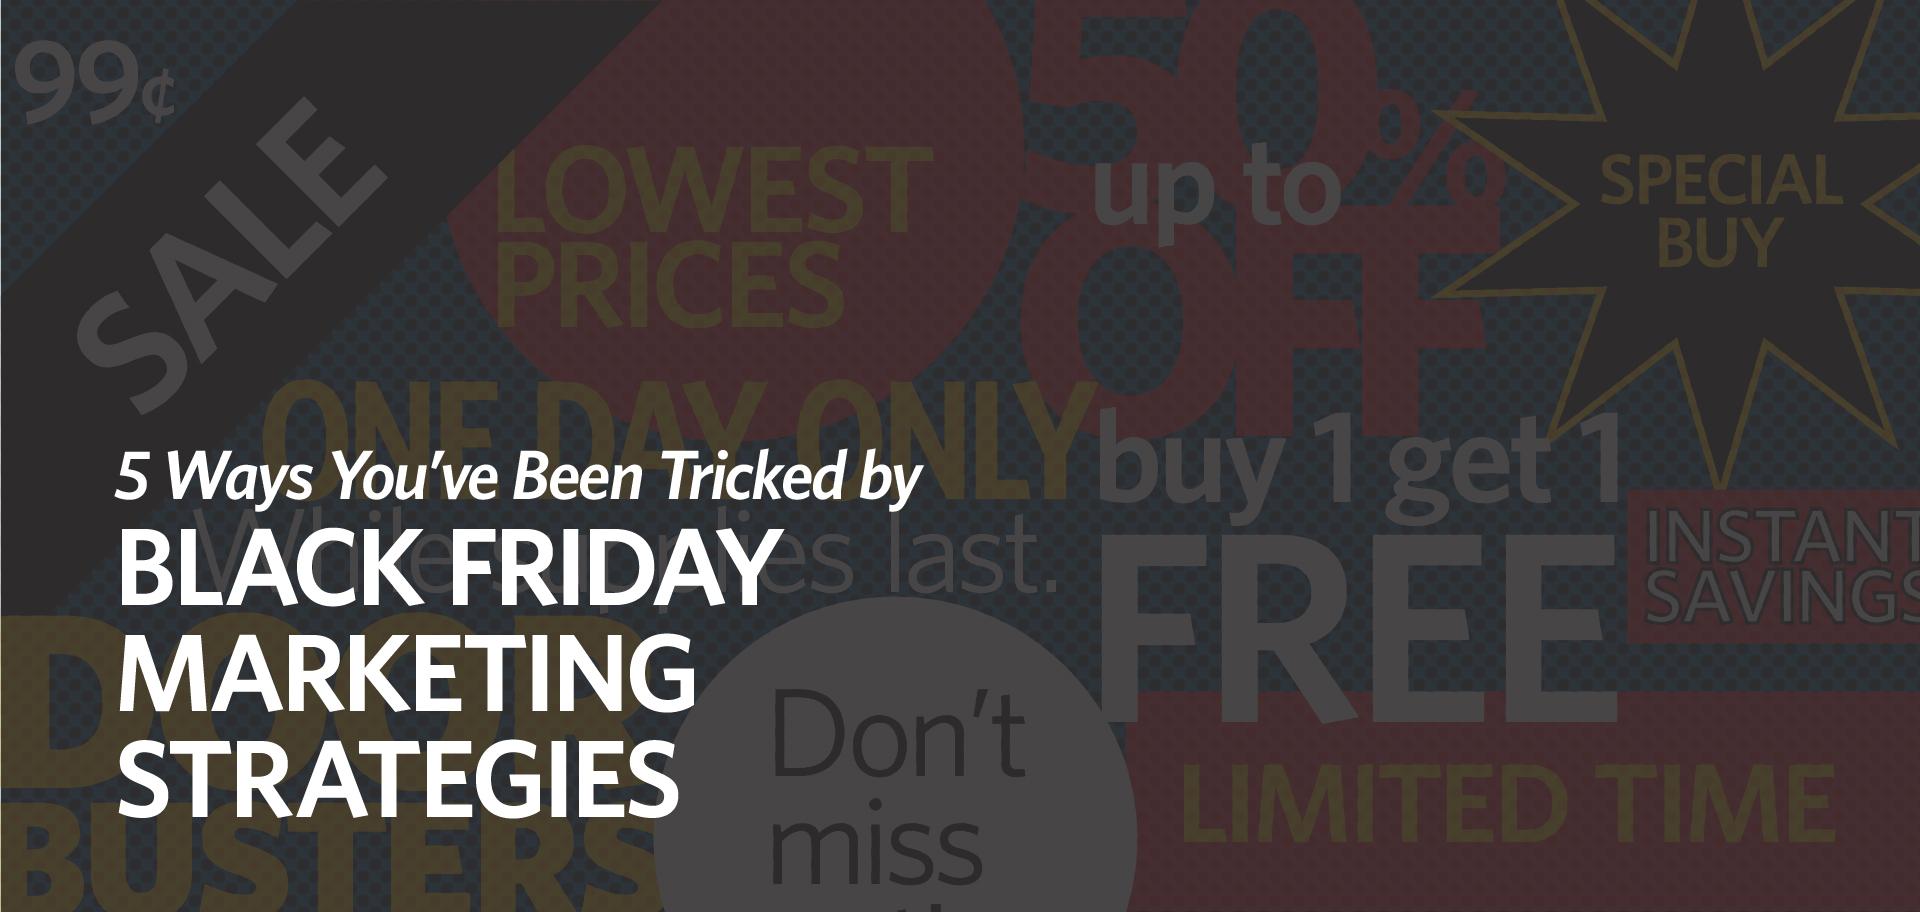 Black Friday Marketing Strategies Kettle Fire Creative black friday marketing 5 Ways You've Been Tricked by Black Friday Marketing Strategies black friday fi